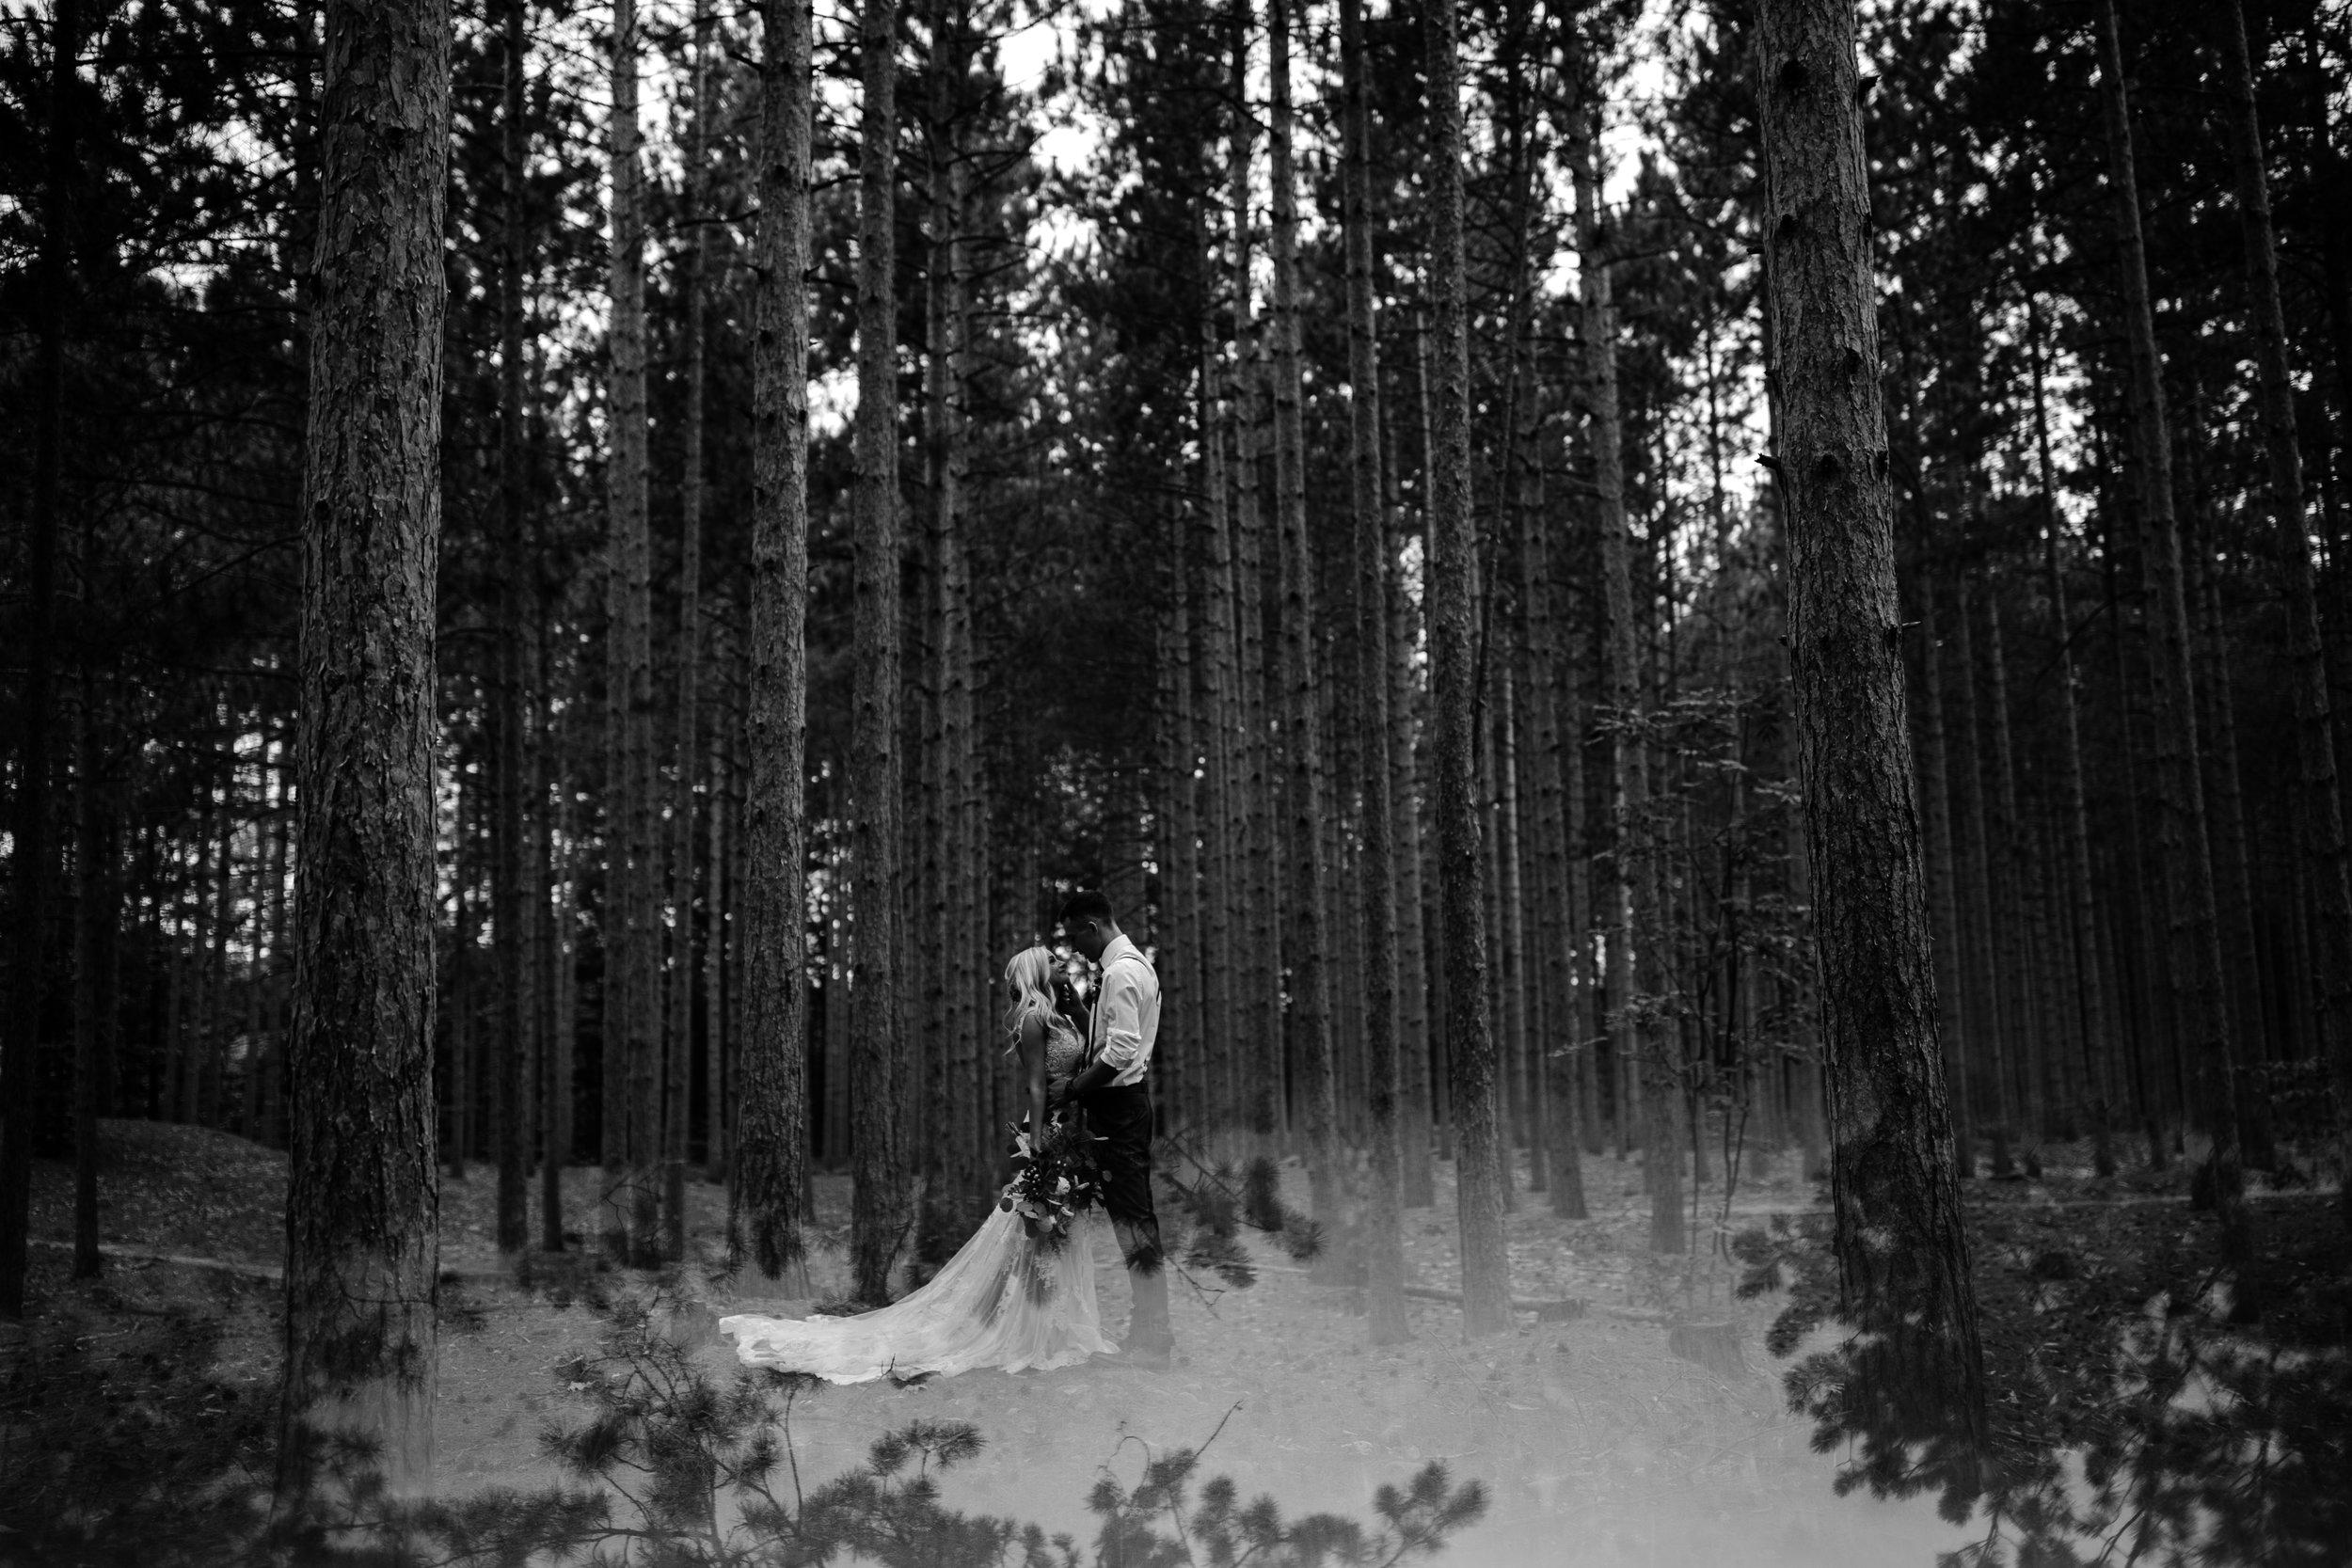 west-michigan-wedding-photographer-whitehall-rachel-austin-chapel-in-the-pines-493.jpg